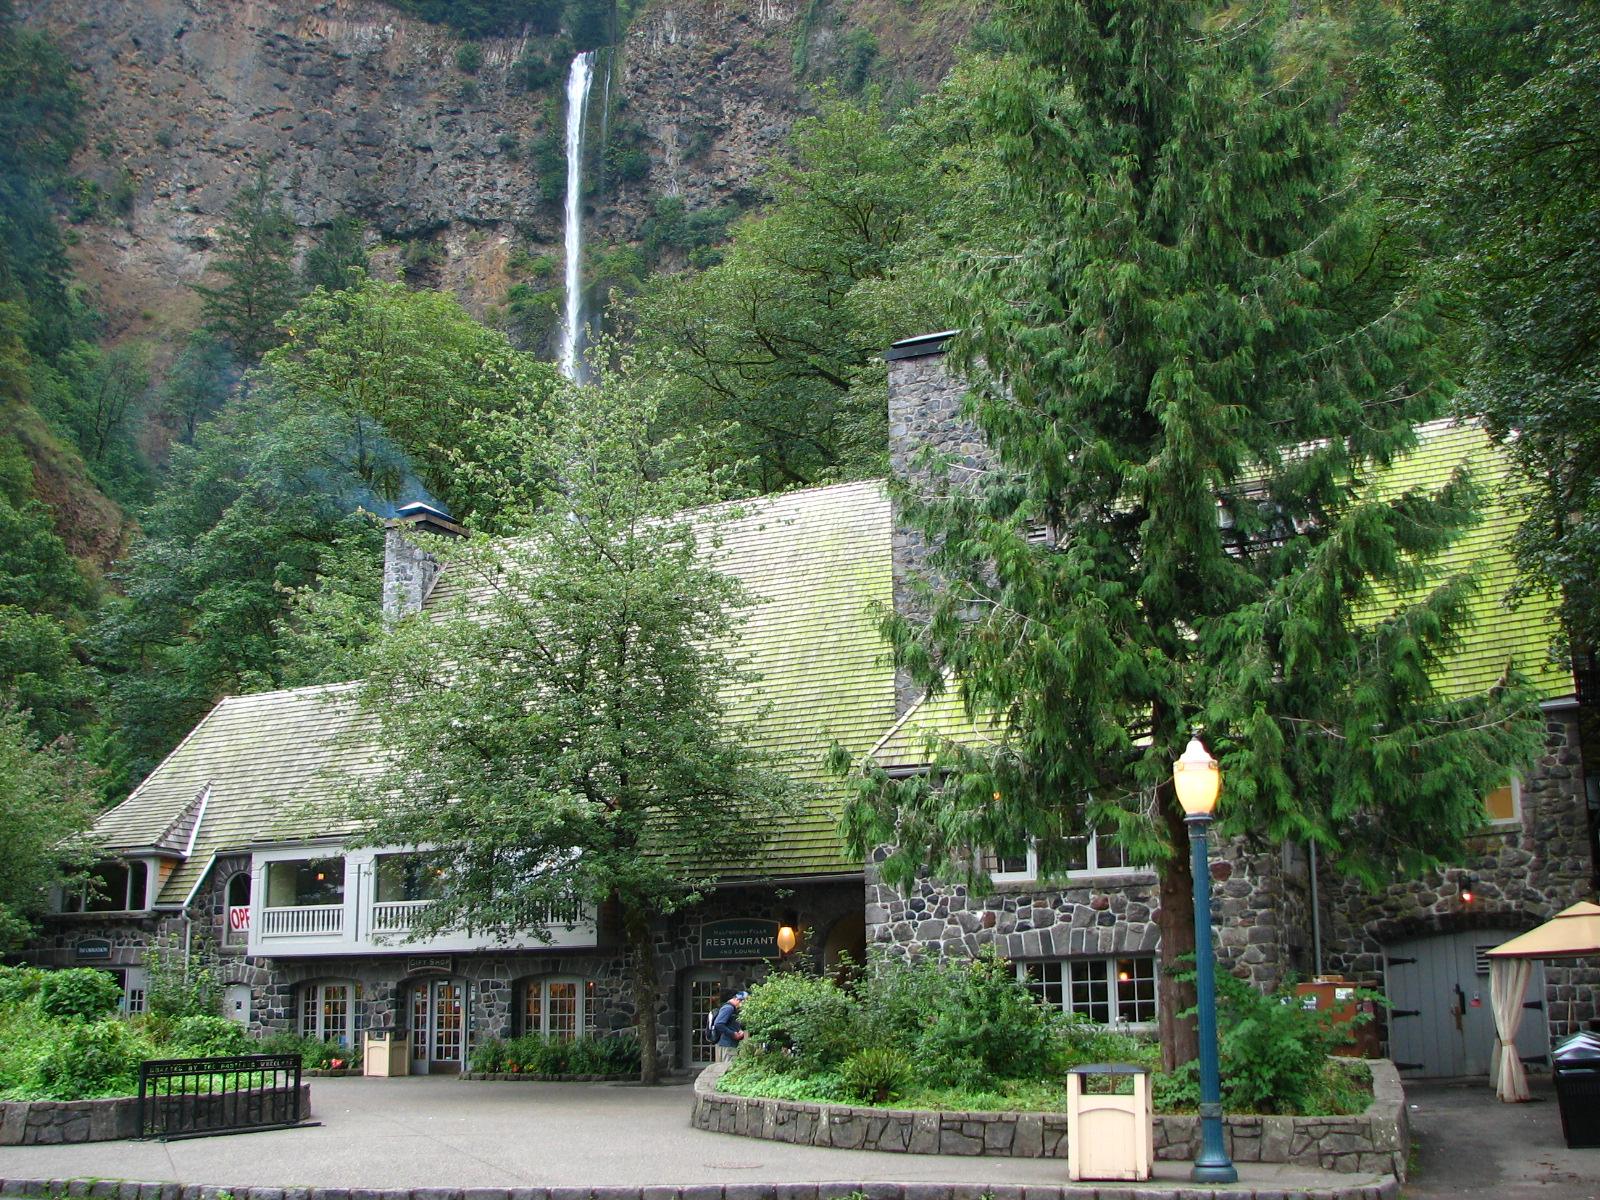 Multnomah Falls Oregon Winter Wallpaper Multnomah Falls Of The Columbia Gorge Amg Inspired